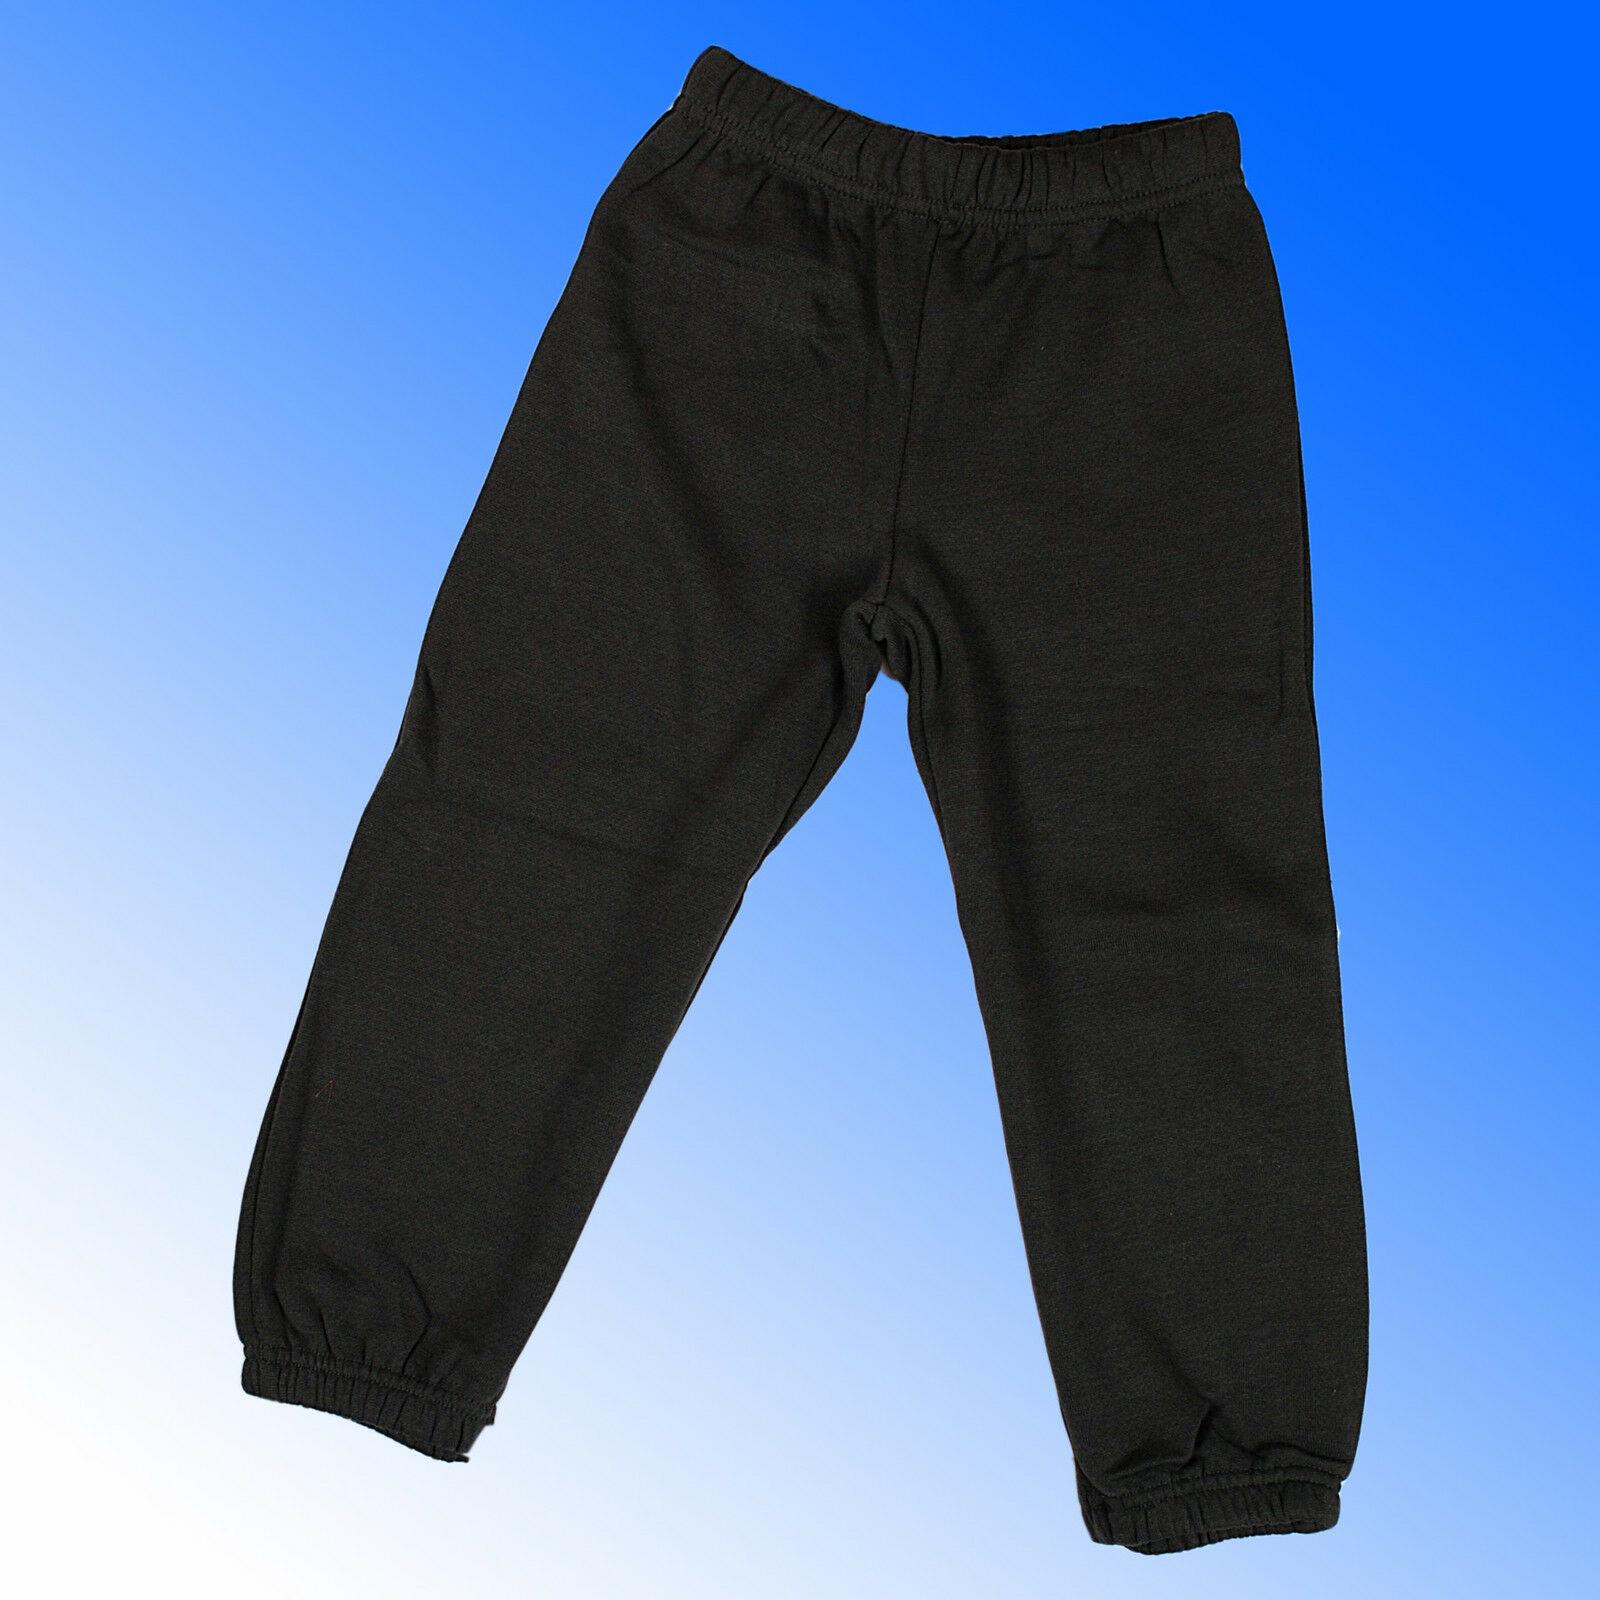 Kids Jogging Bottoms Sweat Pants (Age 12 months) - Navy or Grey £2.47 delivered @ fmsupplies ebay